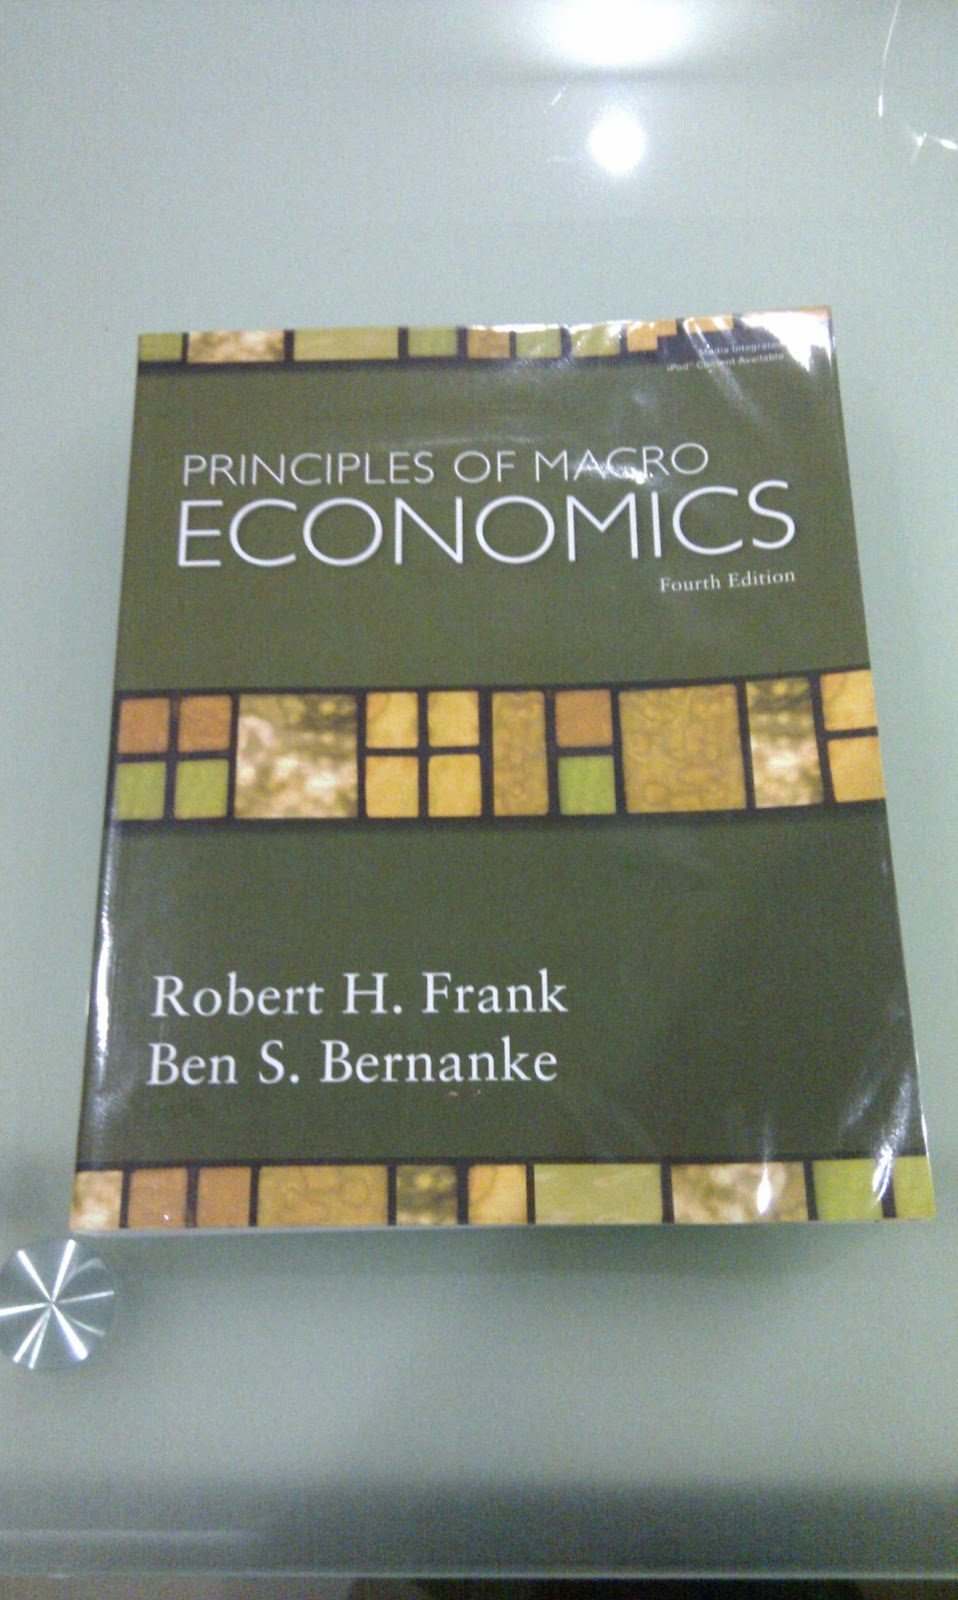 microeconomics 9th edition pindyck pdf